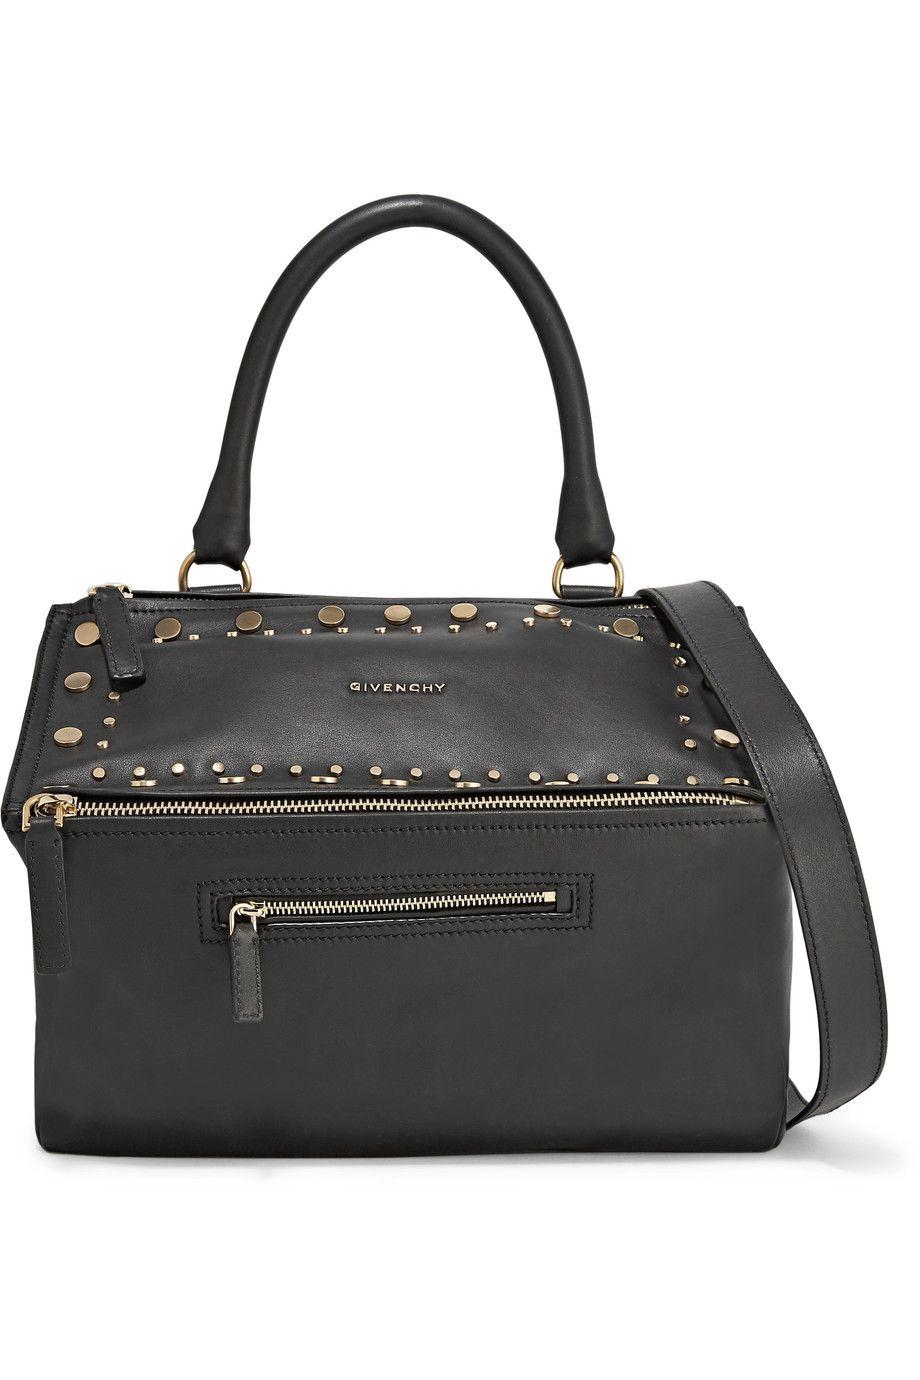 ec0f76ed84b1 GIVENCHY Pandora Studded Leather Shoulder Bag.  givenchy  bags  shoulder  bags  hand